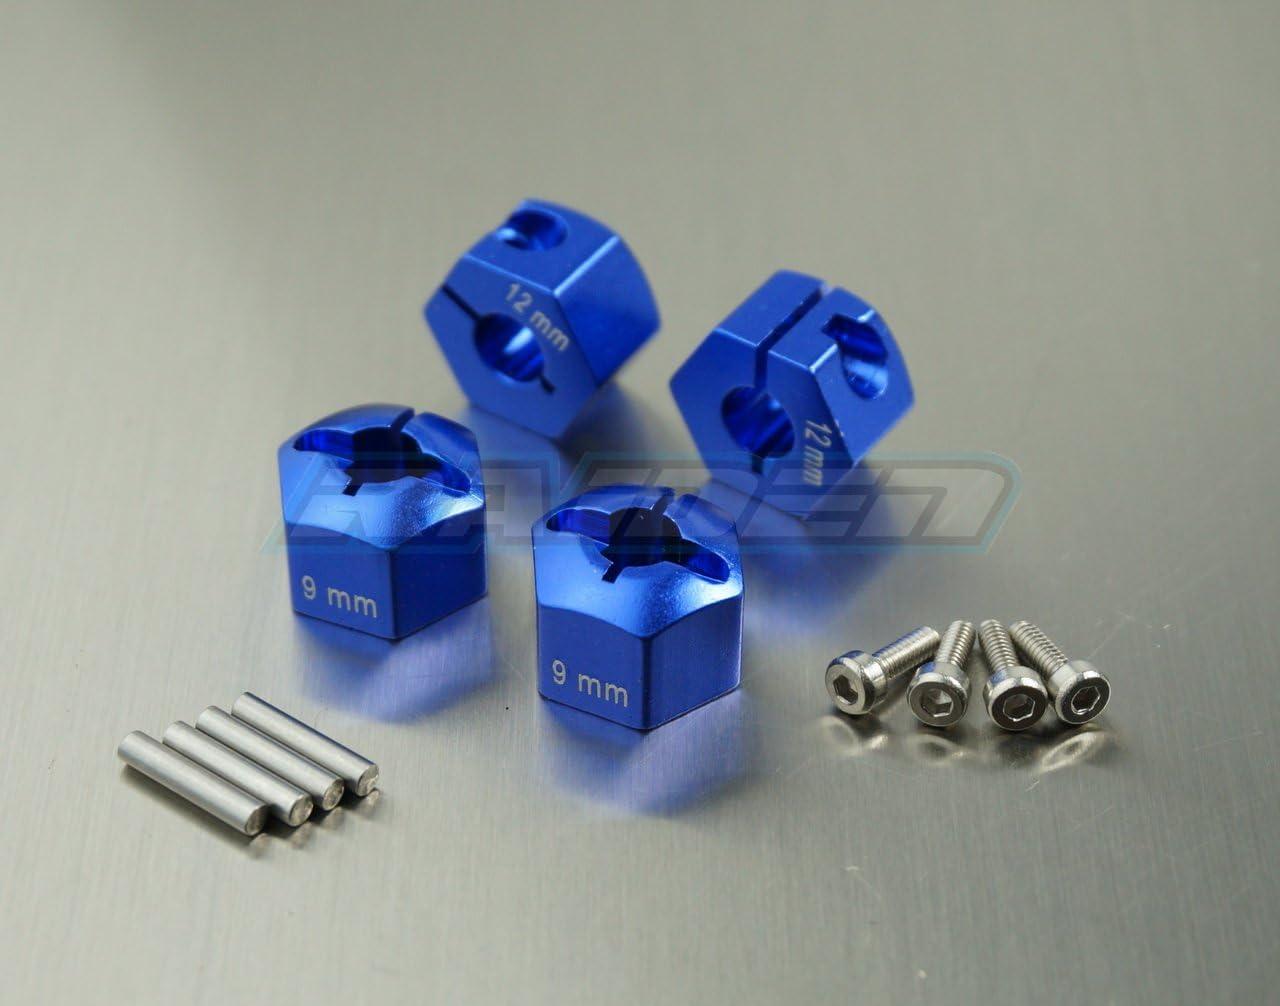 Raidenracing Aluminum Alloy 12mm X 9mm Widen Wheel Hub Hex Drive Adaptor for RC Crawler SCX10 F350 Wraith Blue